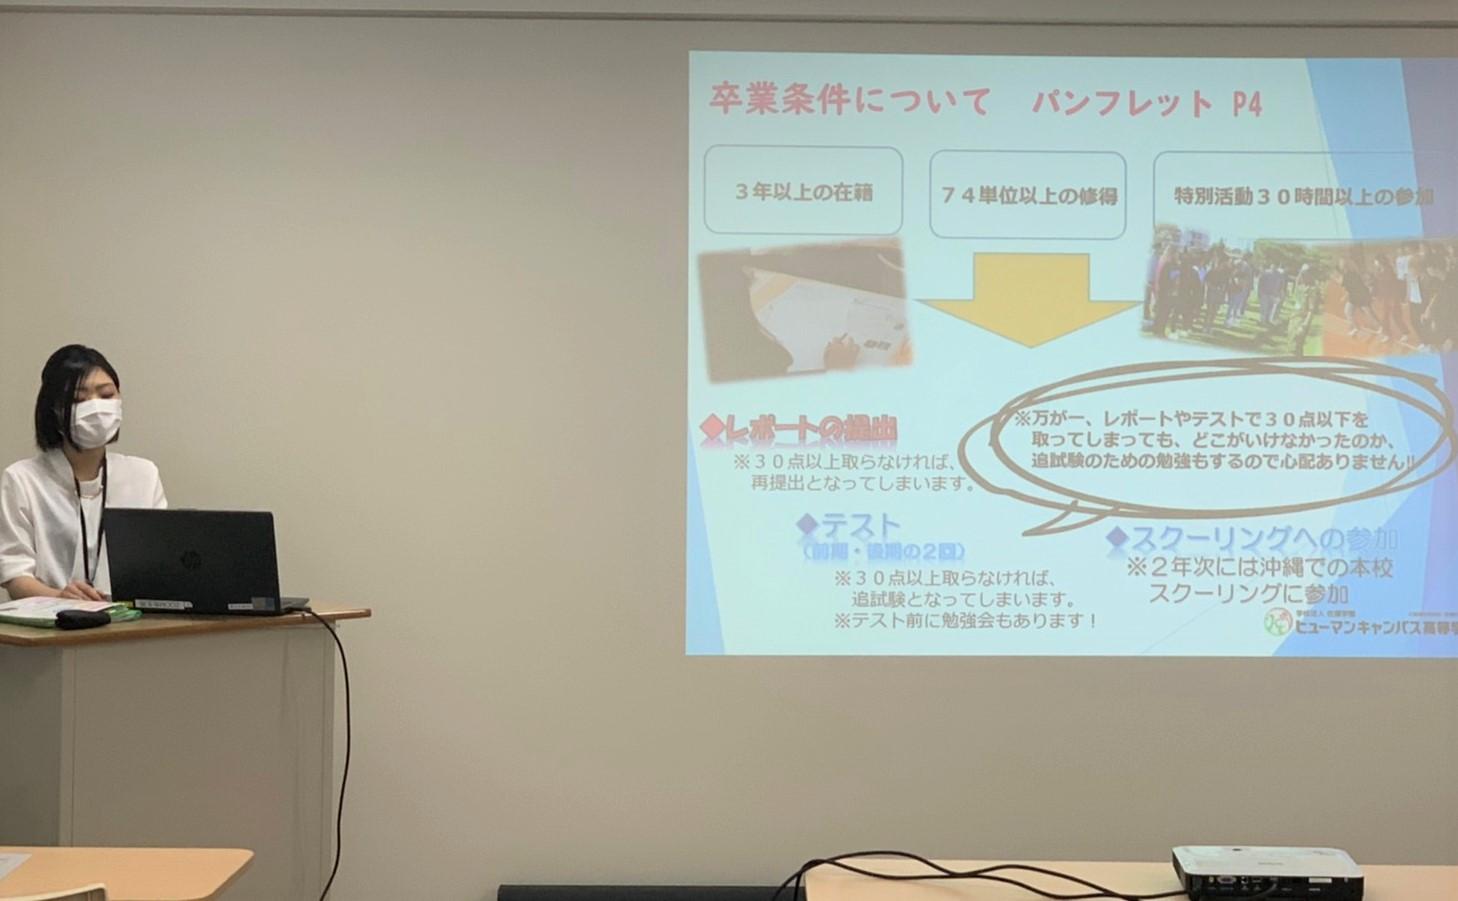 https://www.hchs.ed.jp/campus/takamatsu/images/0822%E3%83%A1%E3%82%A4%E3%82%AFOC%E2%91%A2.jpg